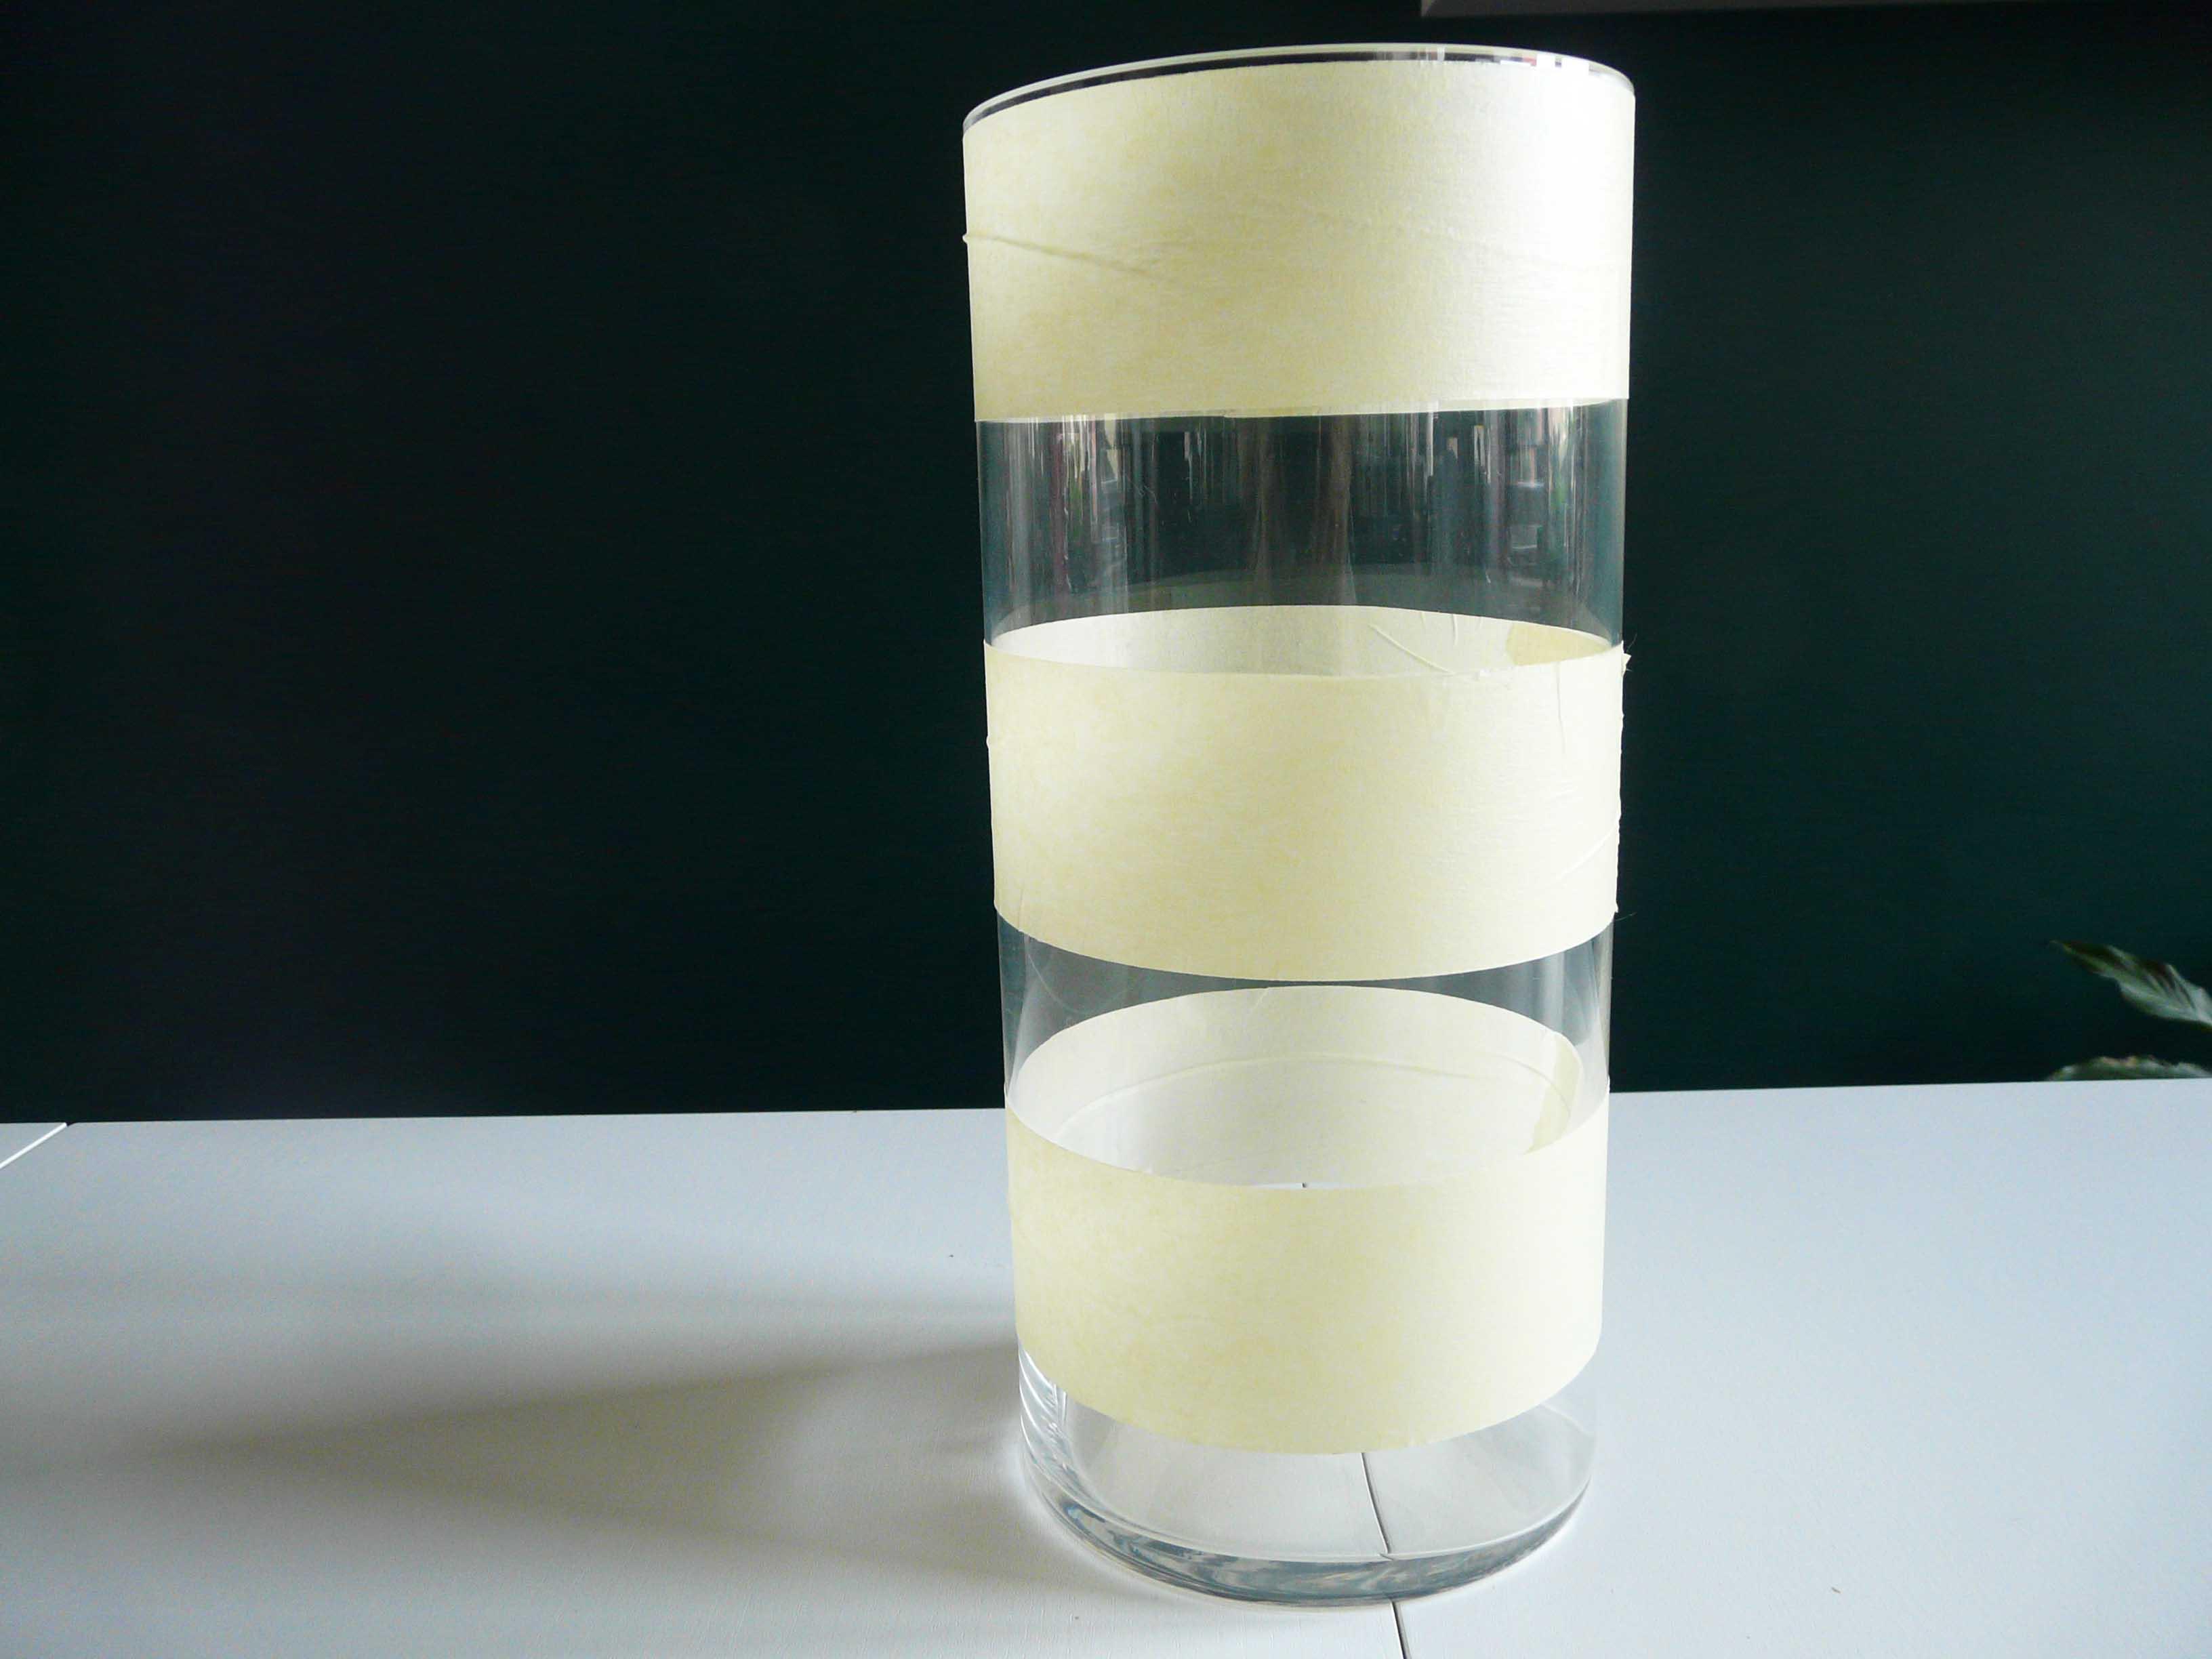 Vaas met afplaktape